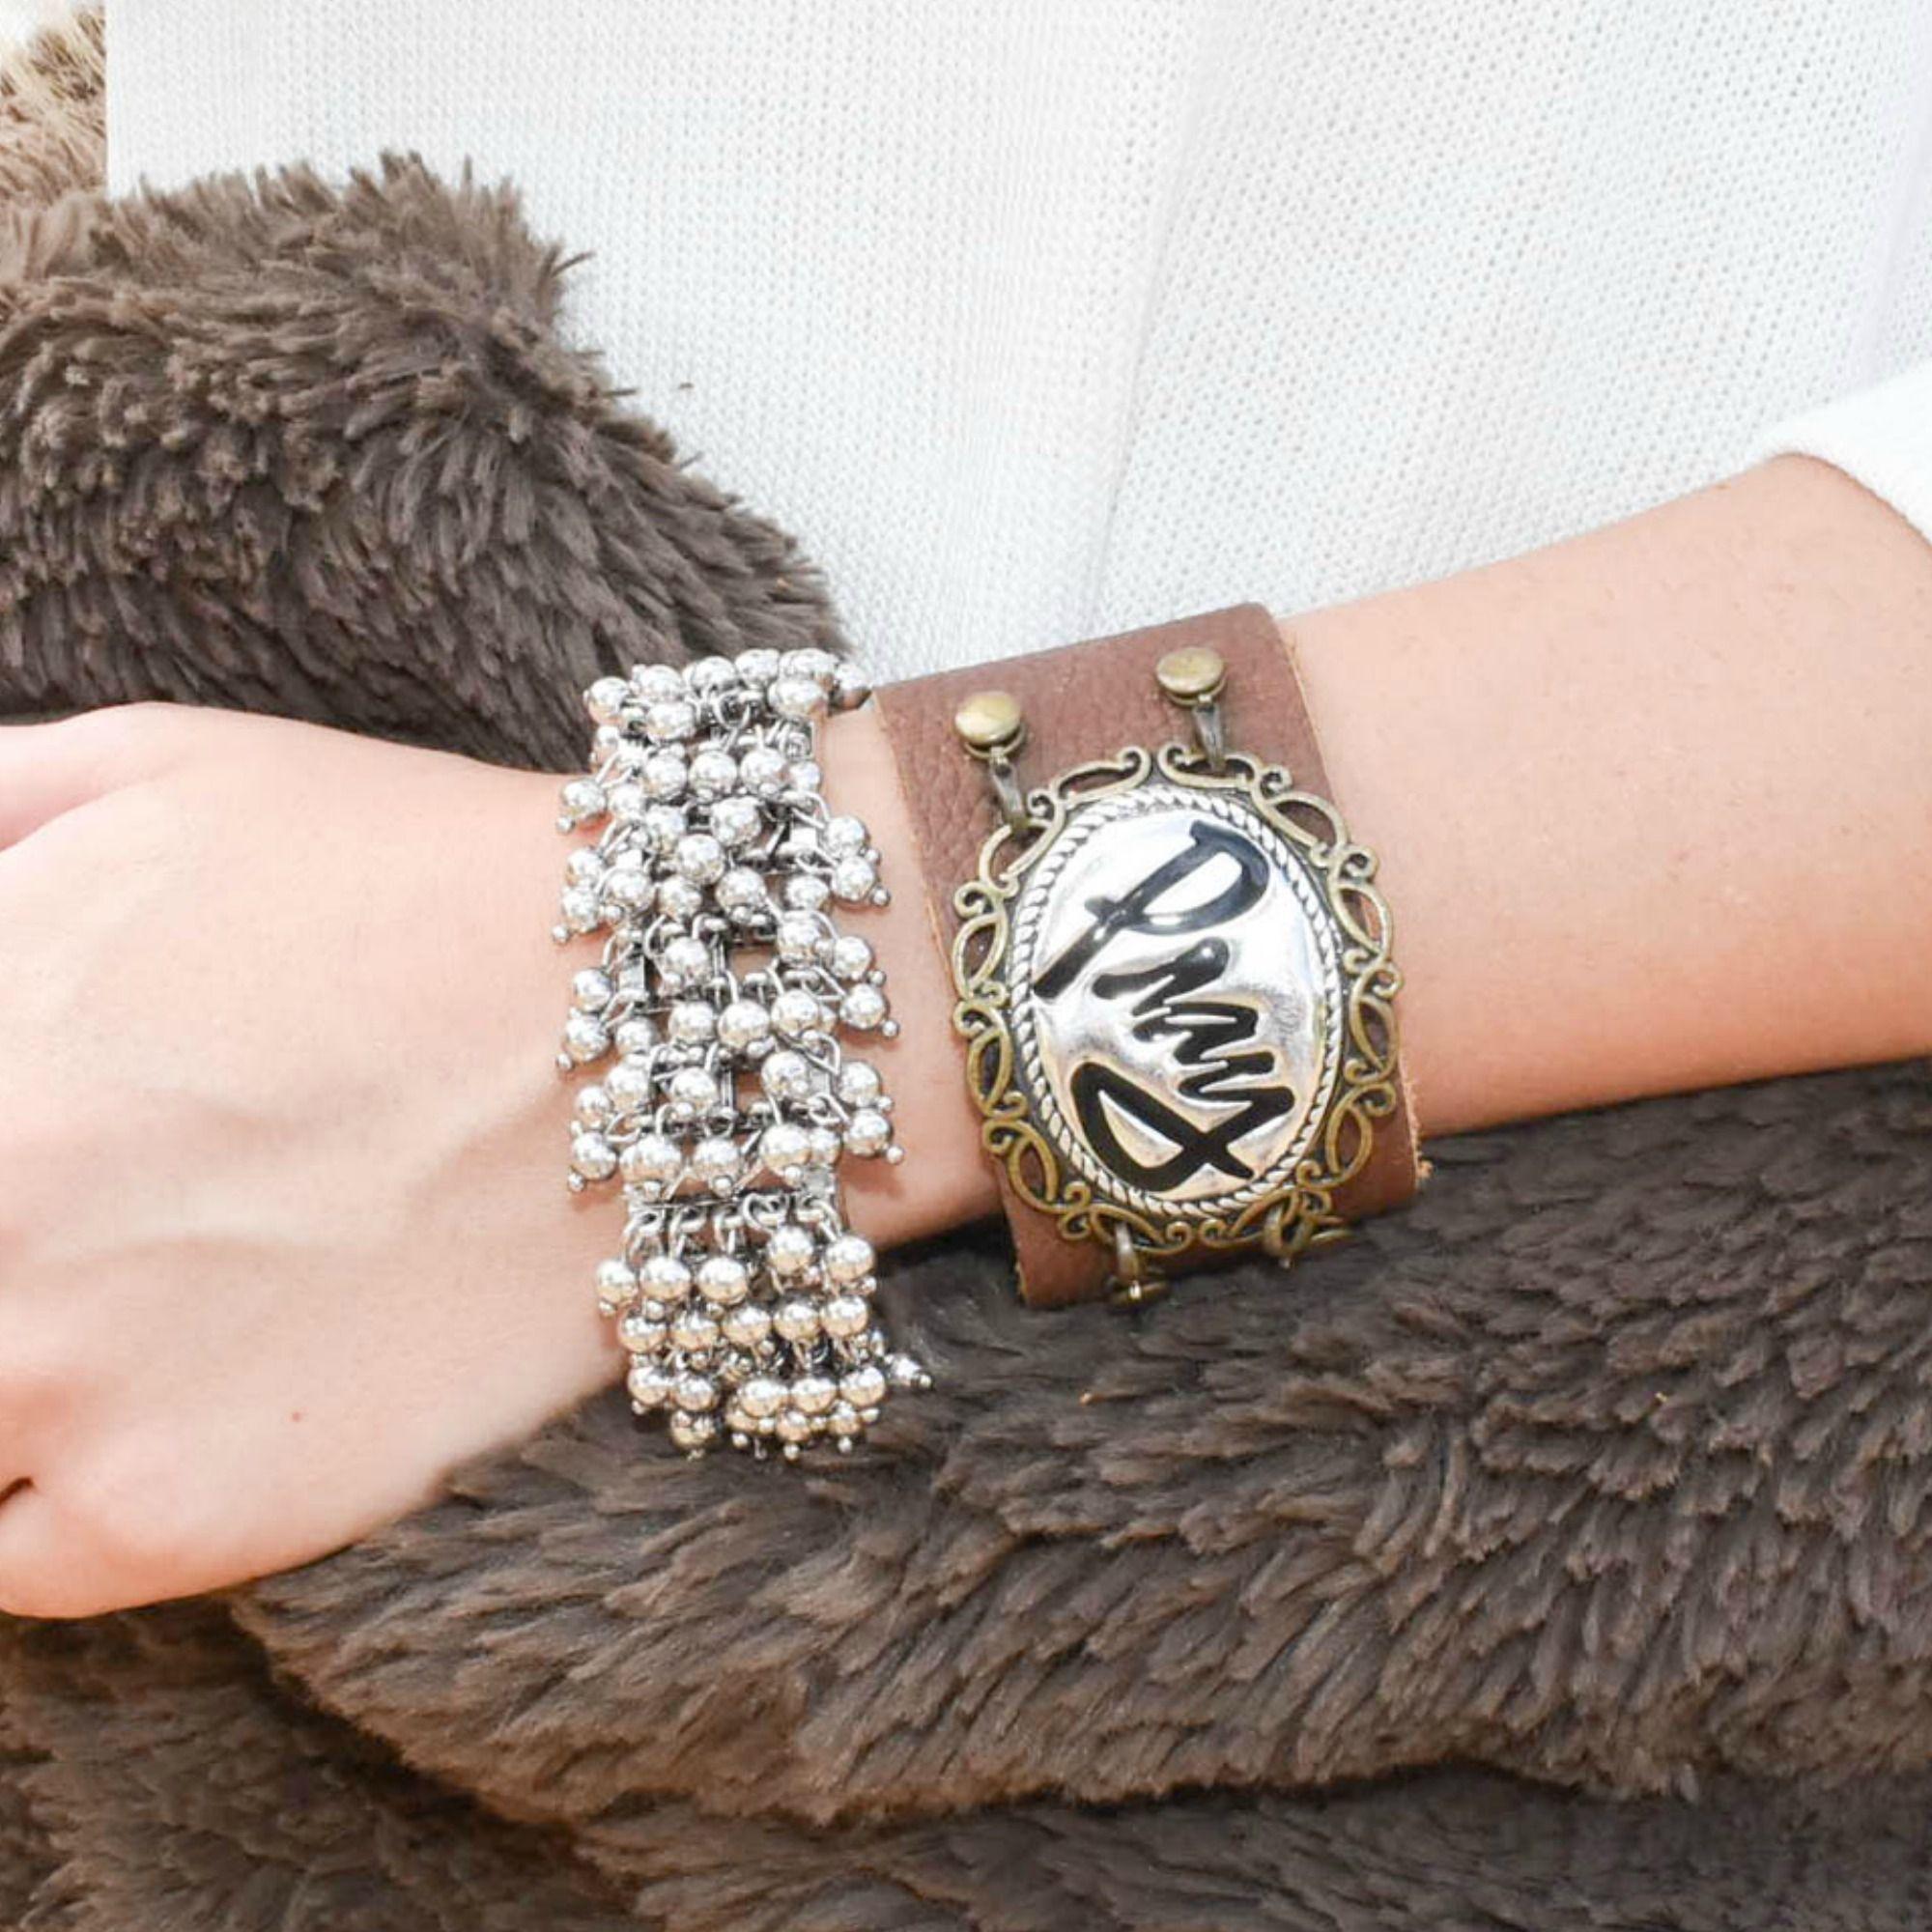 Wanda Bracelet Item Pb200 Silver Hooked To An Elastic Bangle Create A Flirty Look